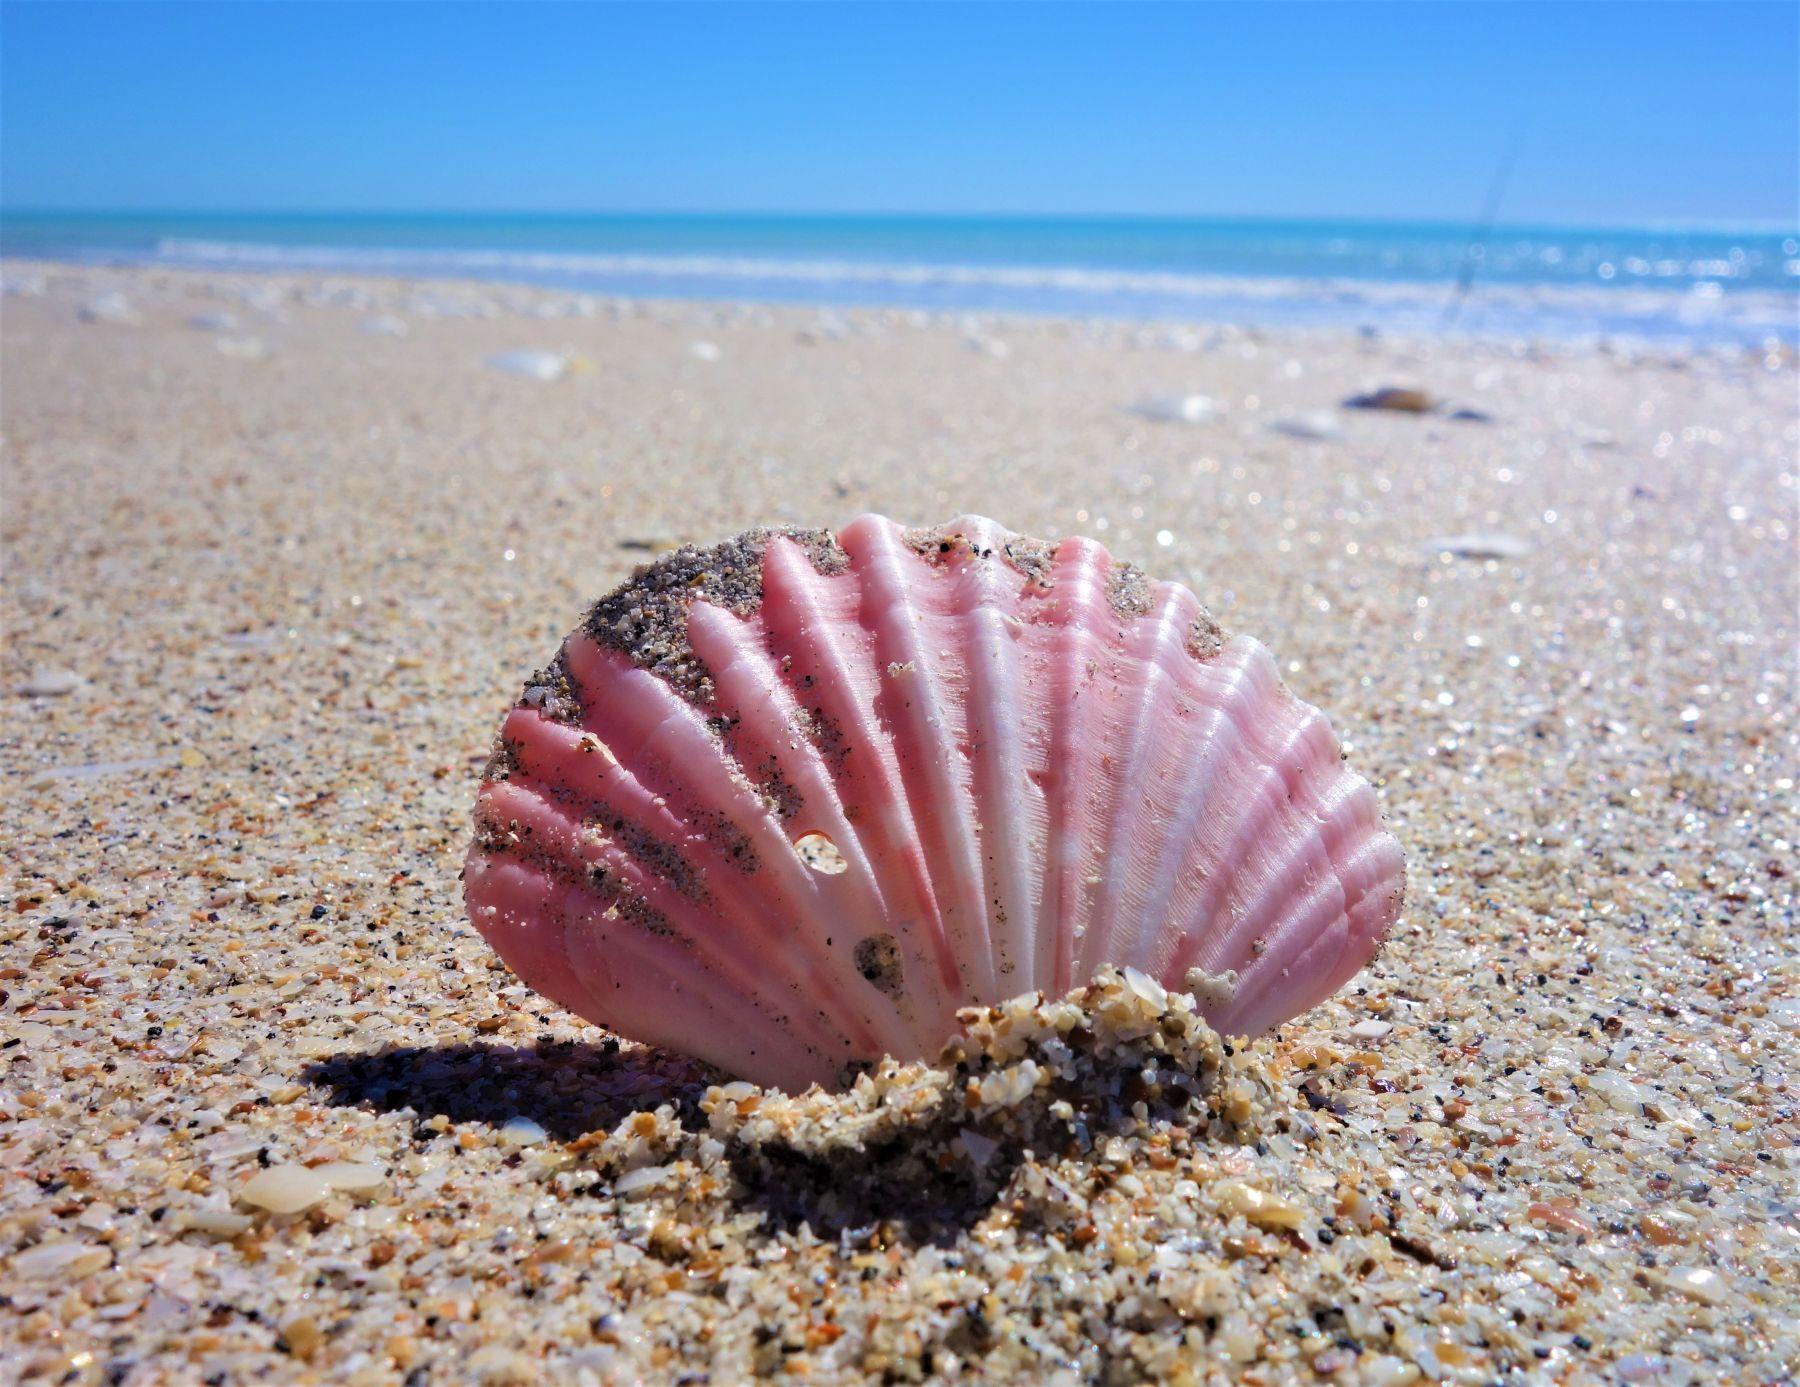 Muschel am Eighty Mile Beach in Australien